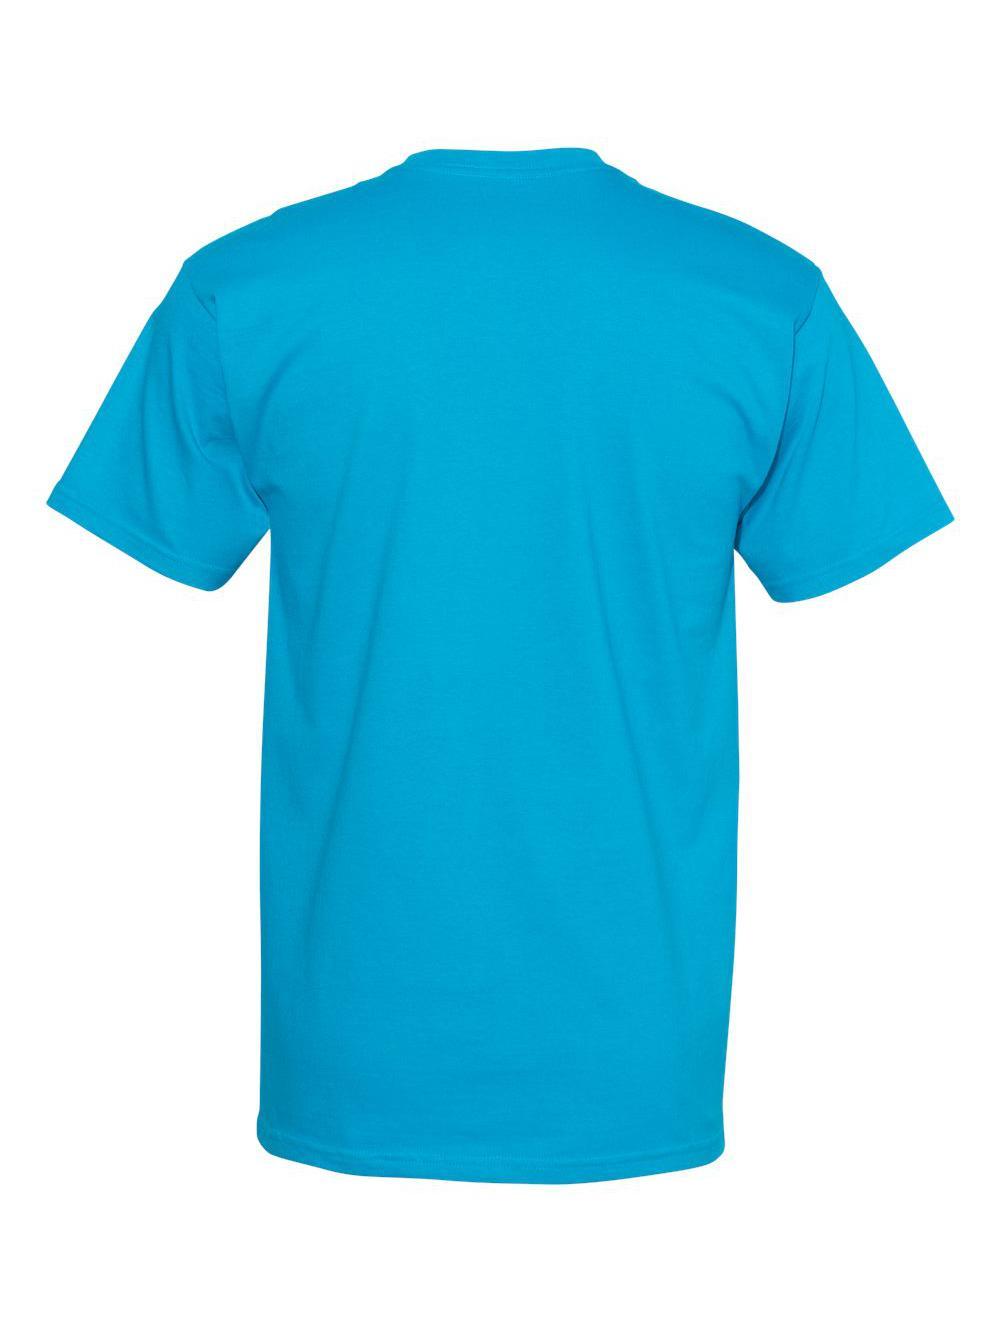 ALSTYLE-Premium-T-Shirt-1701 thumbnail 68